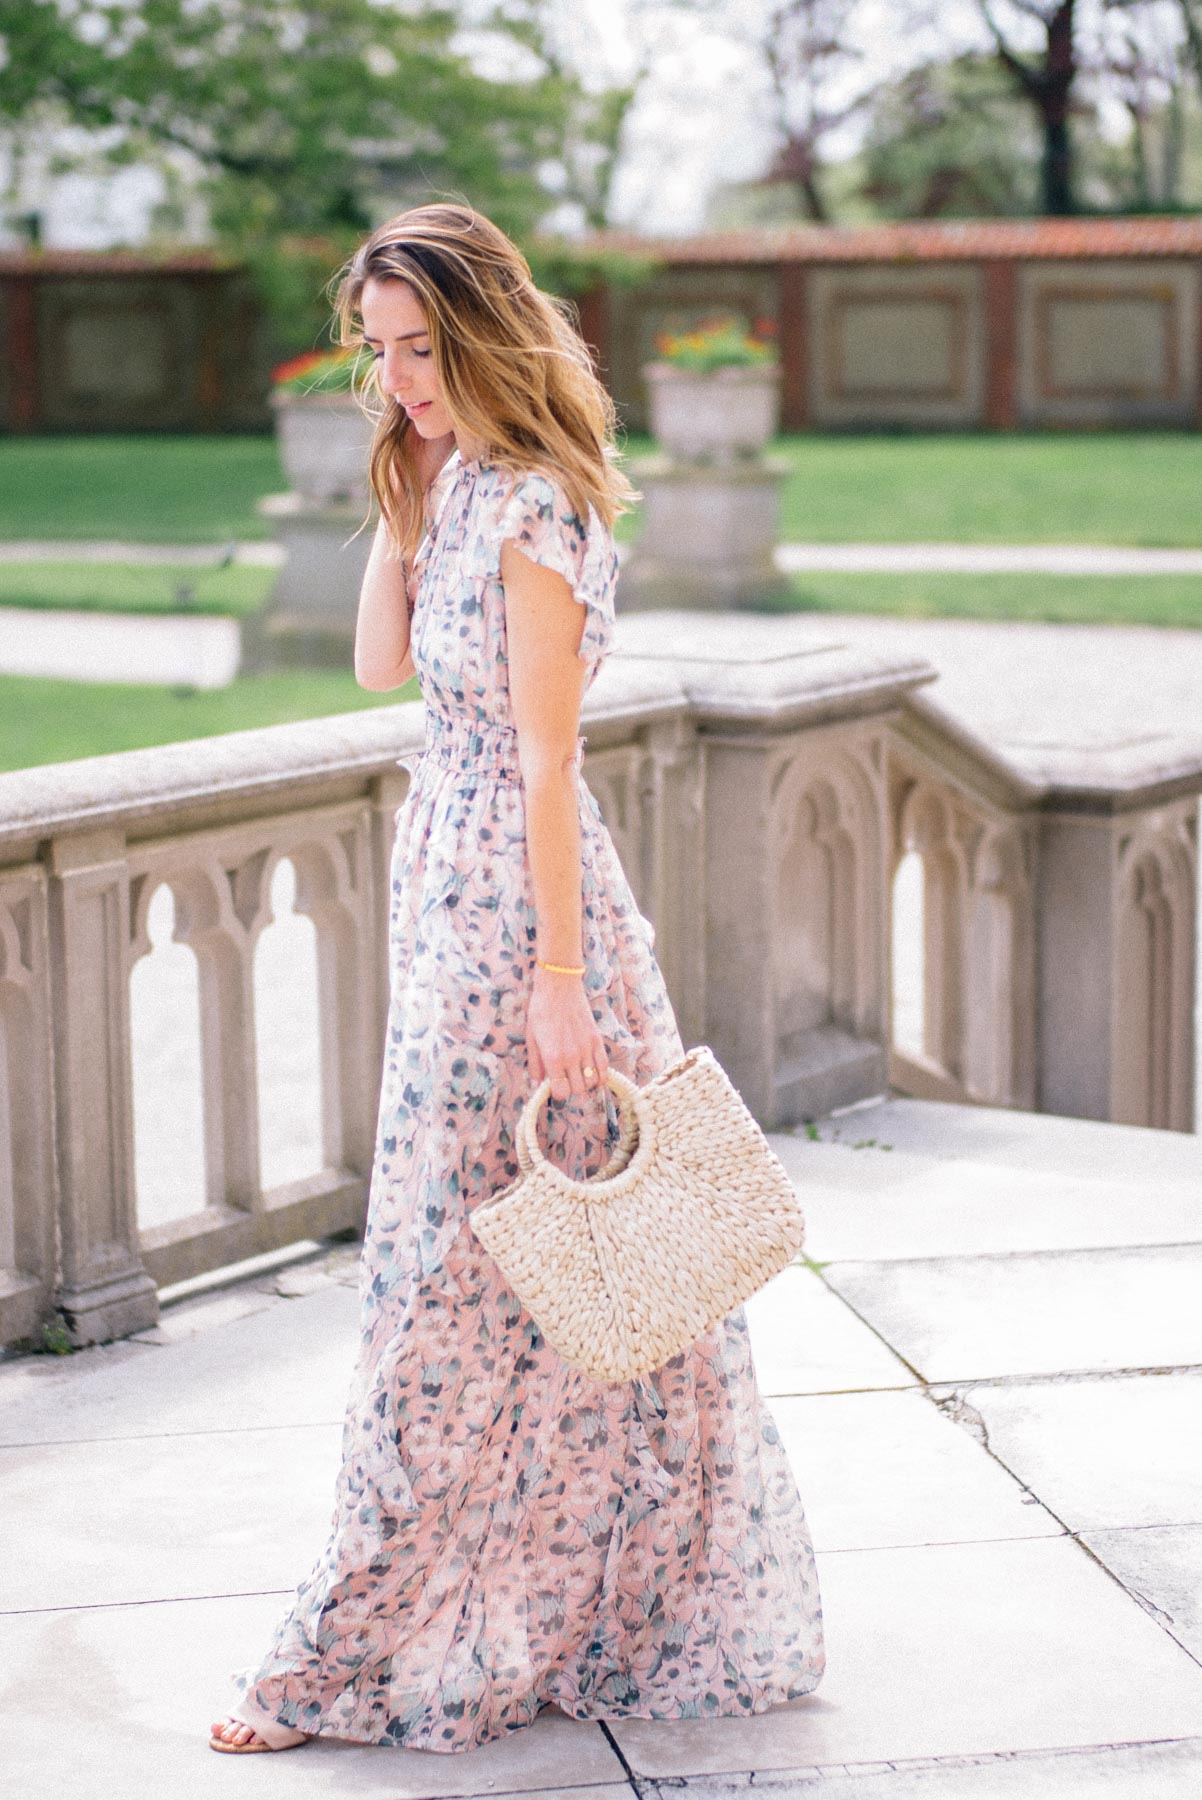 Jess Ann Kirby wears a Shoshanna printed maxi dress for a go-to summer wedding look